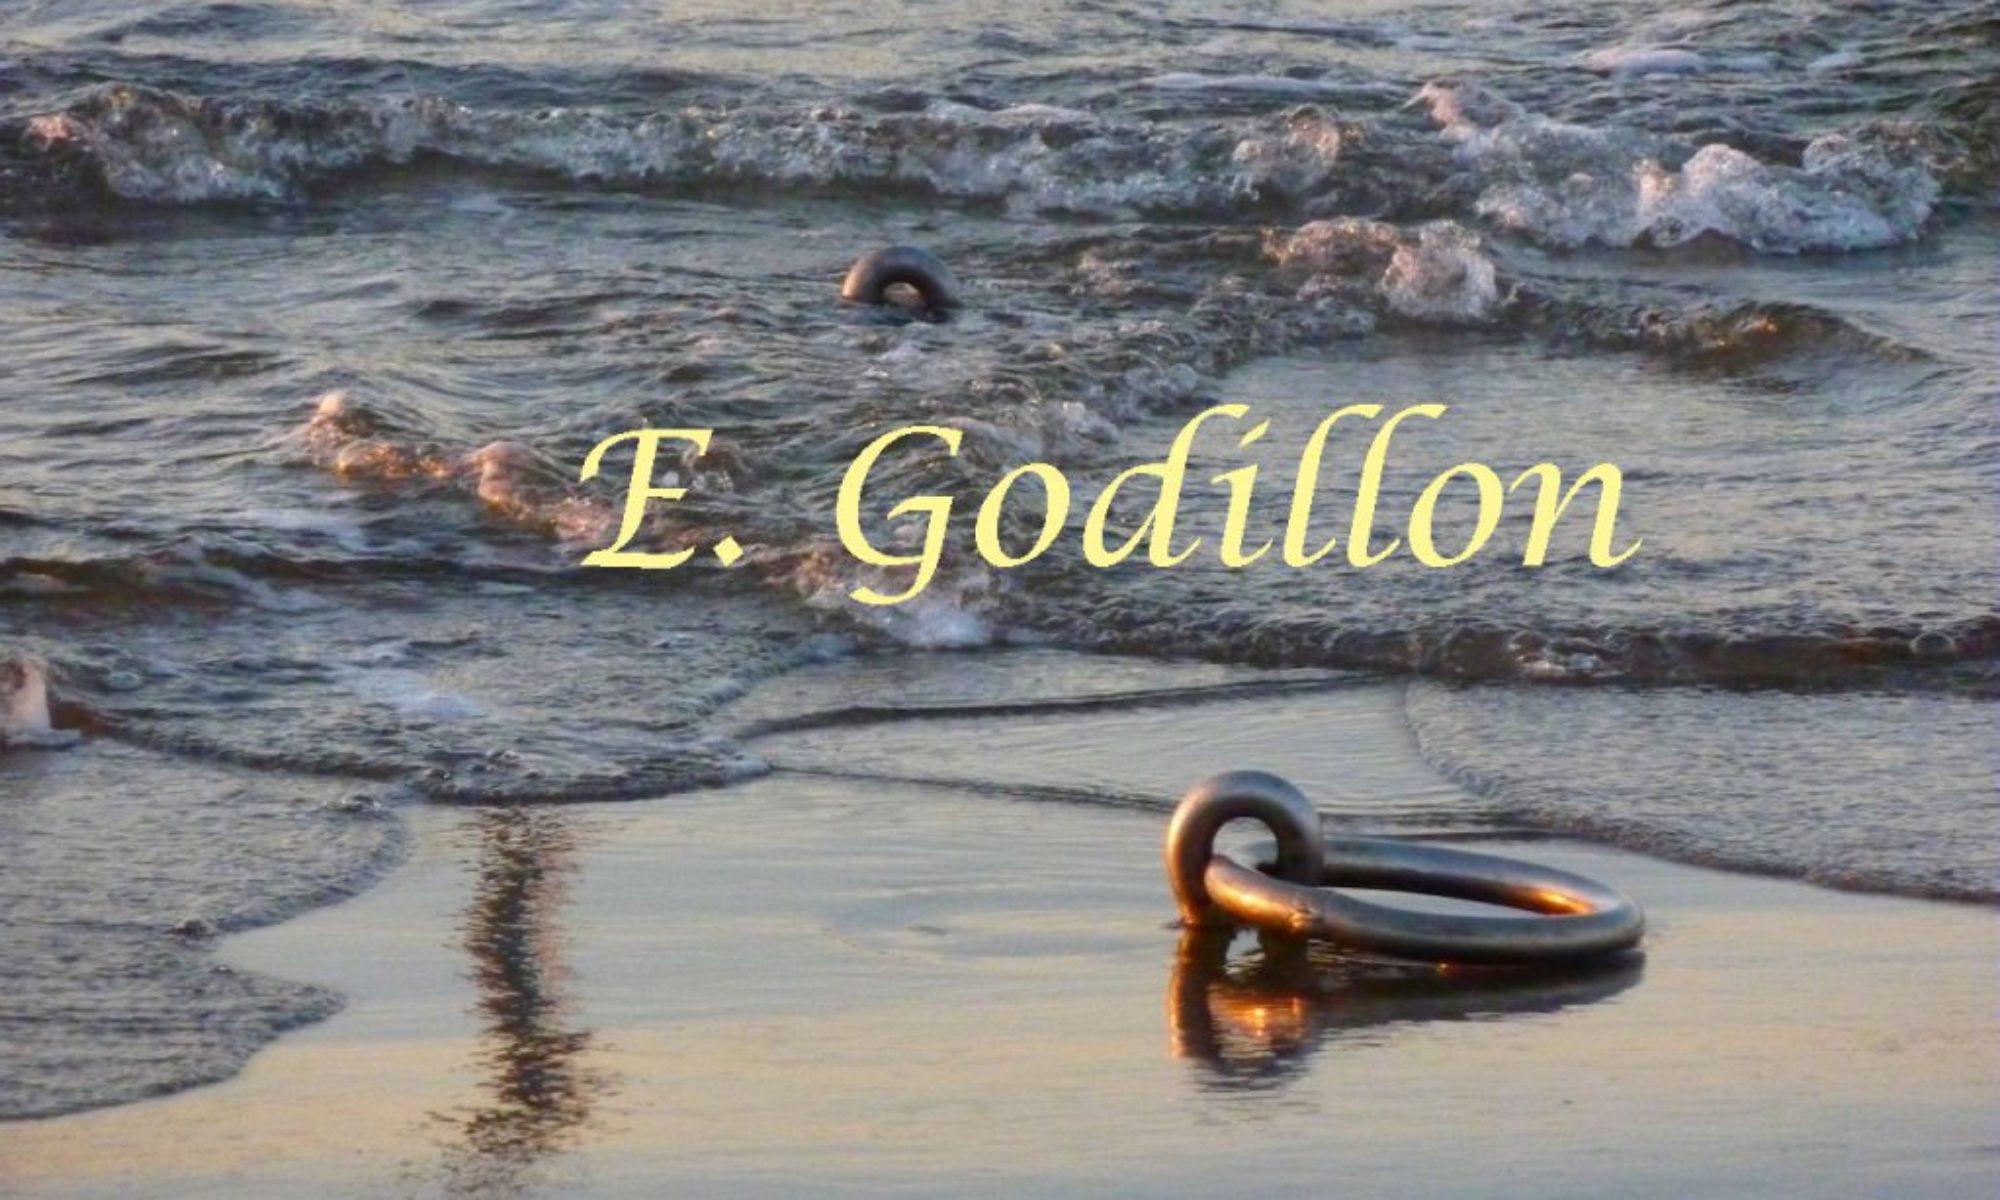 Emmanuel Godillon Photos